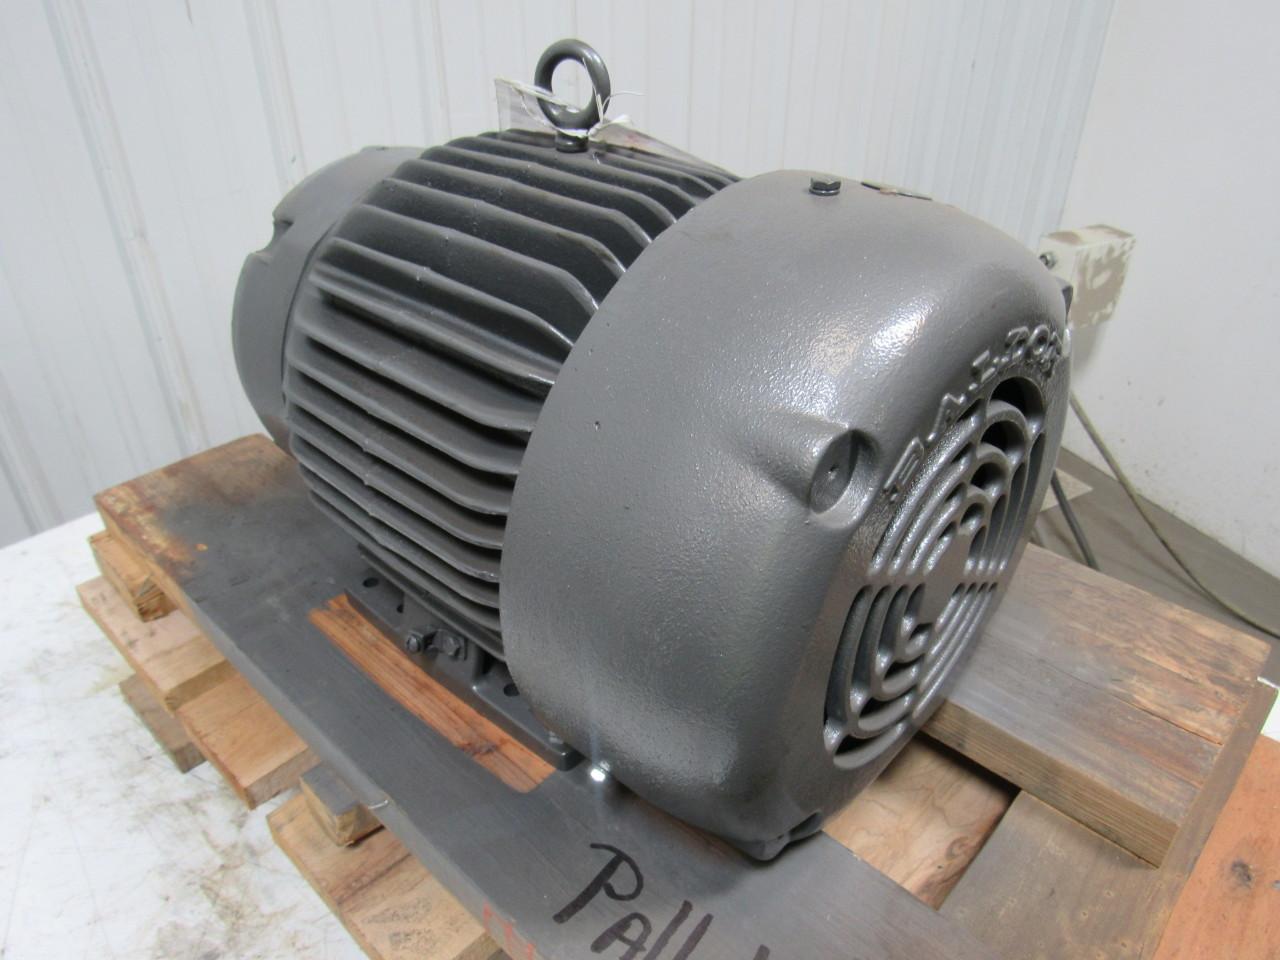 Baldor 07k373w242g1 2 speed electric motor 3 1 5 hp 1725 for Electric motor 1 5 hp